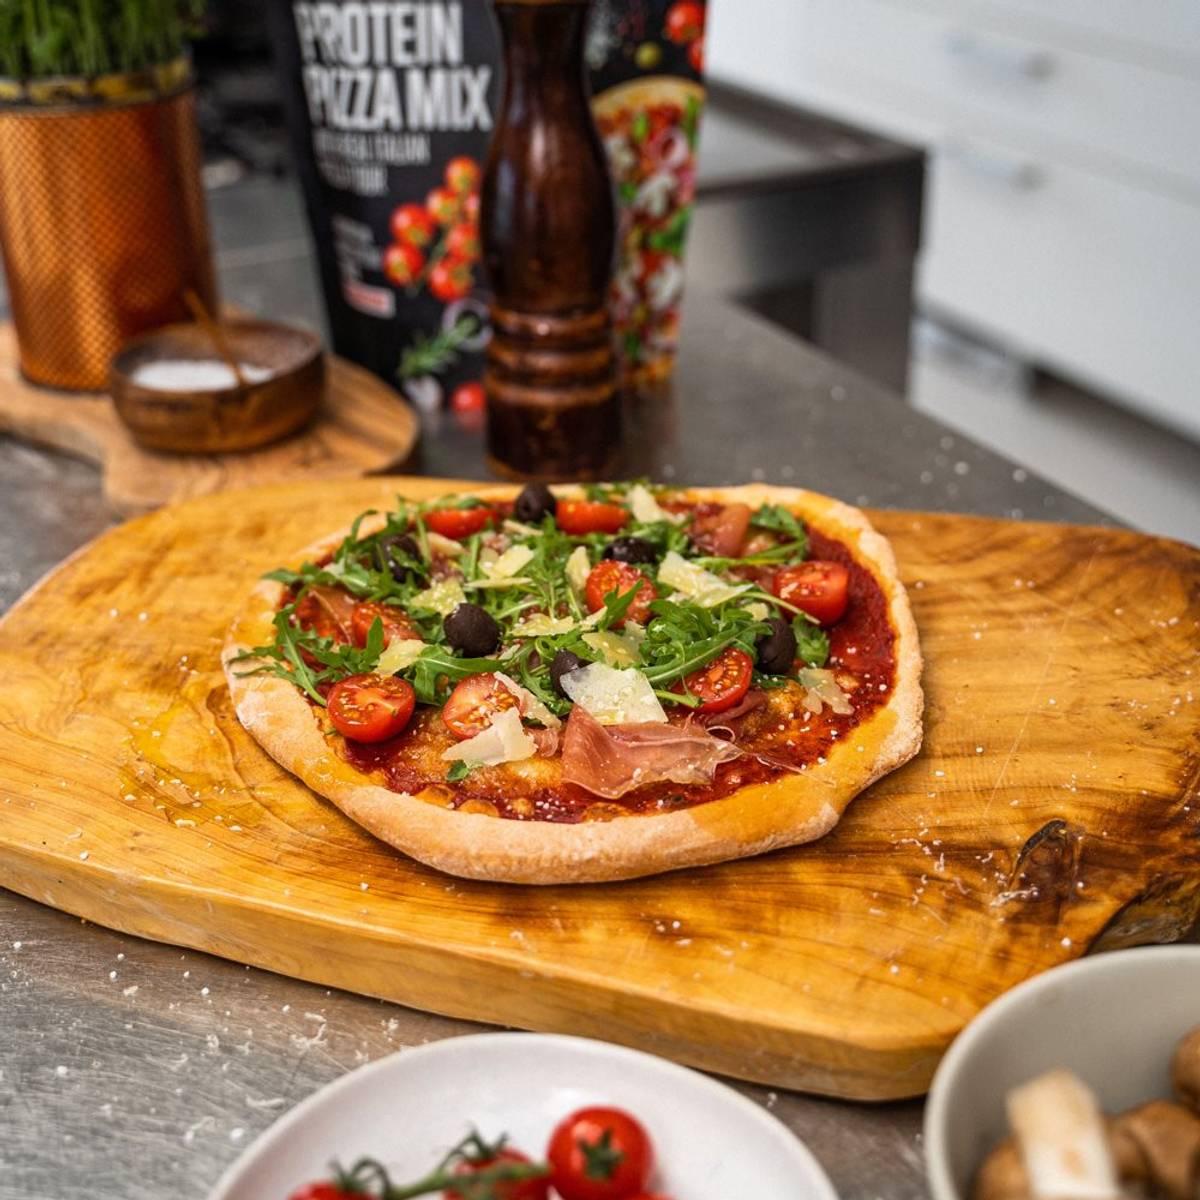 Bodylab - Protein Pizza Mix 1000g